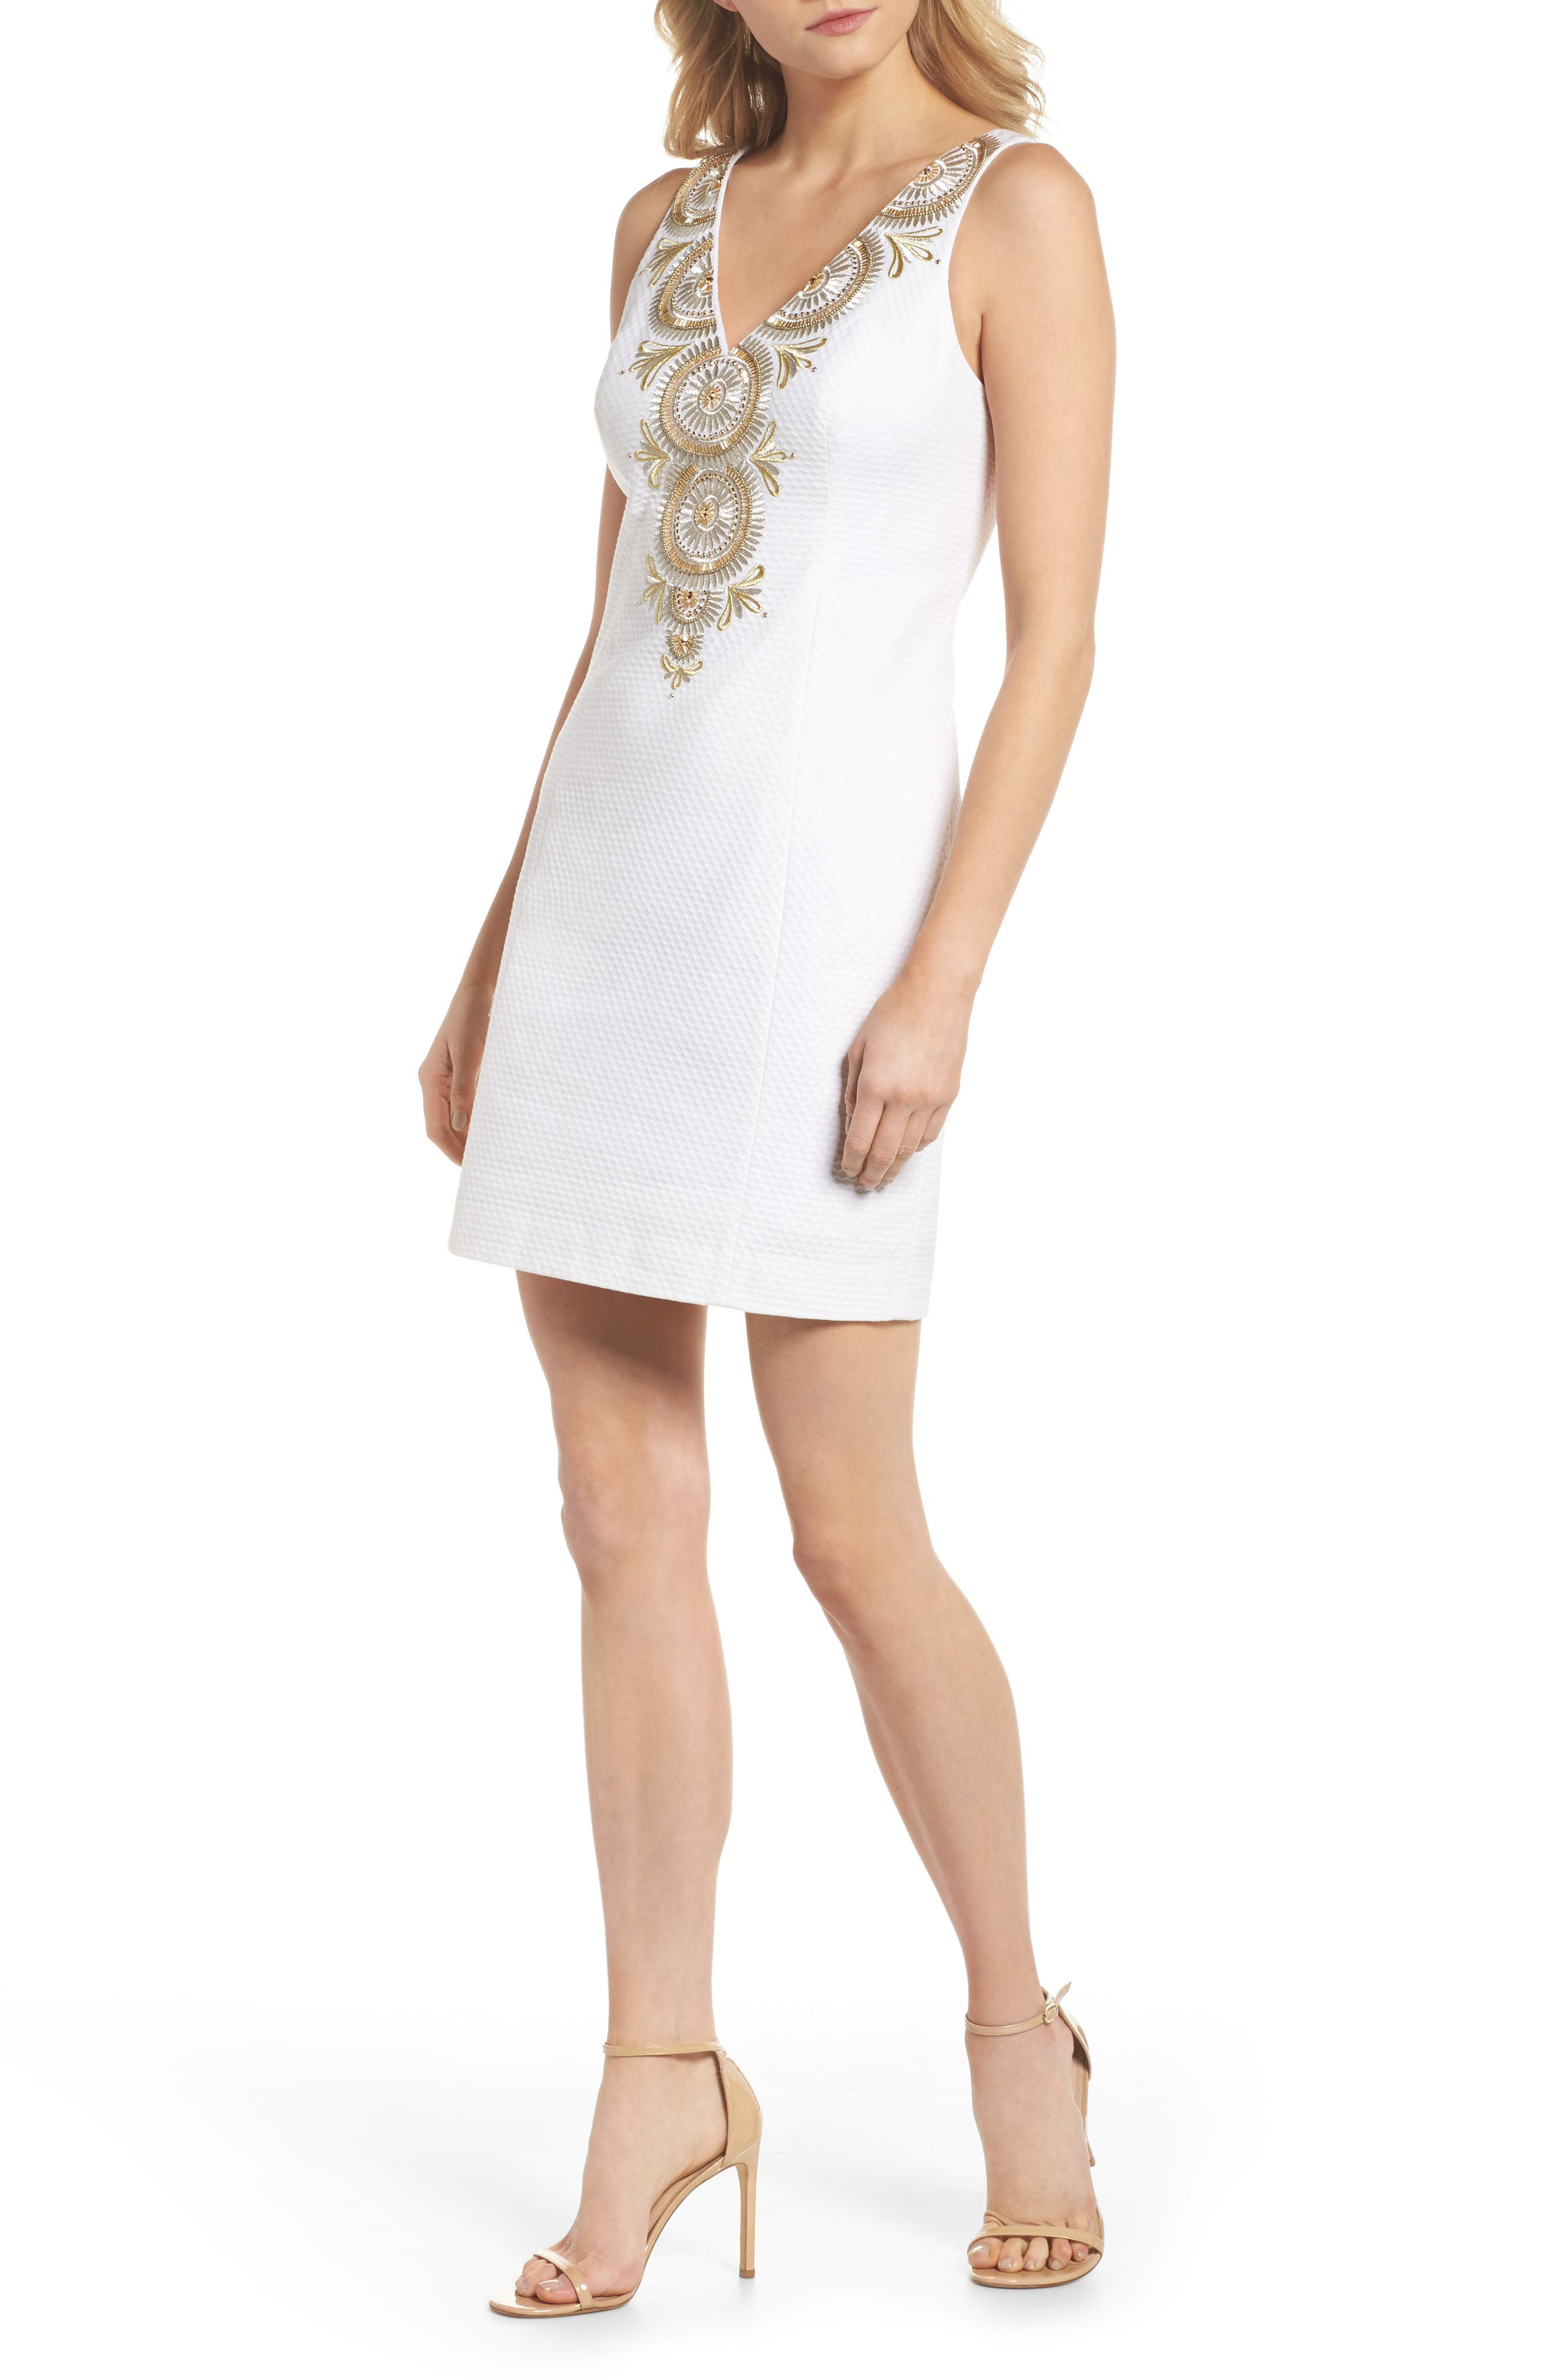 Alternate Image 1 Selected - Lilly Pulitzer® Gabby Metallic Sheath Dress